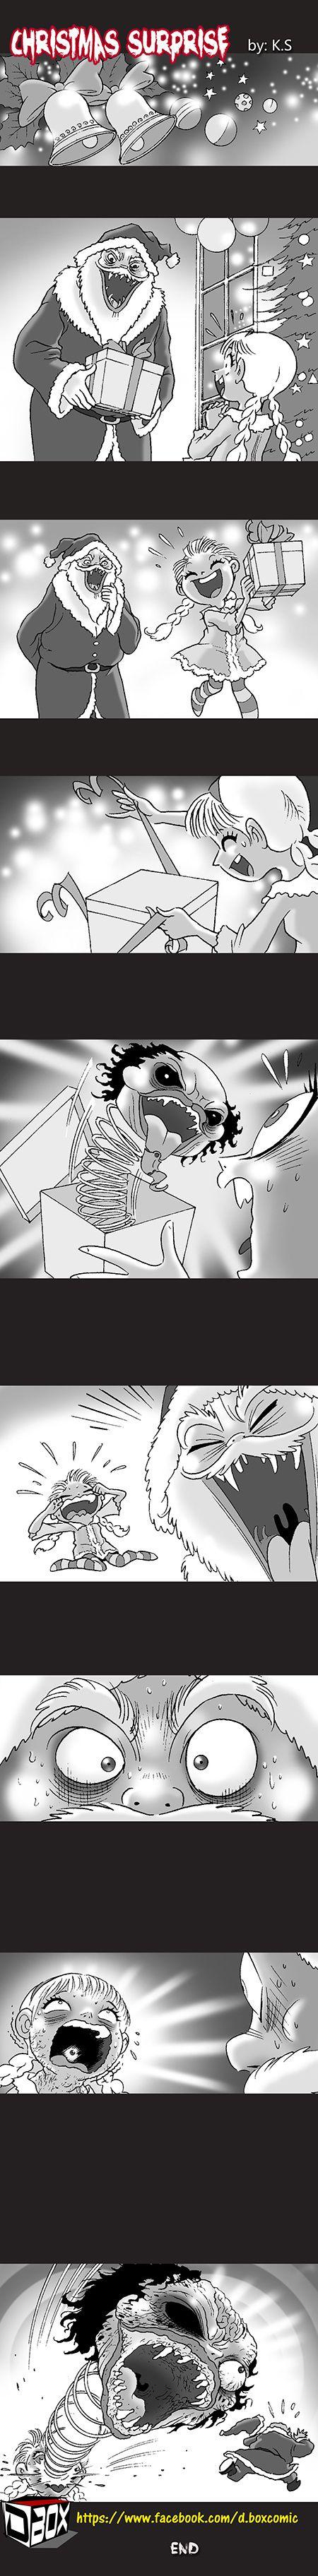 Silent Horror :: Christmas Surprise | Tapastic Comics - image 1